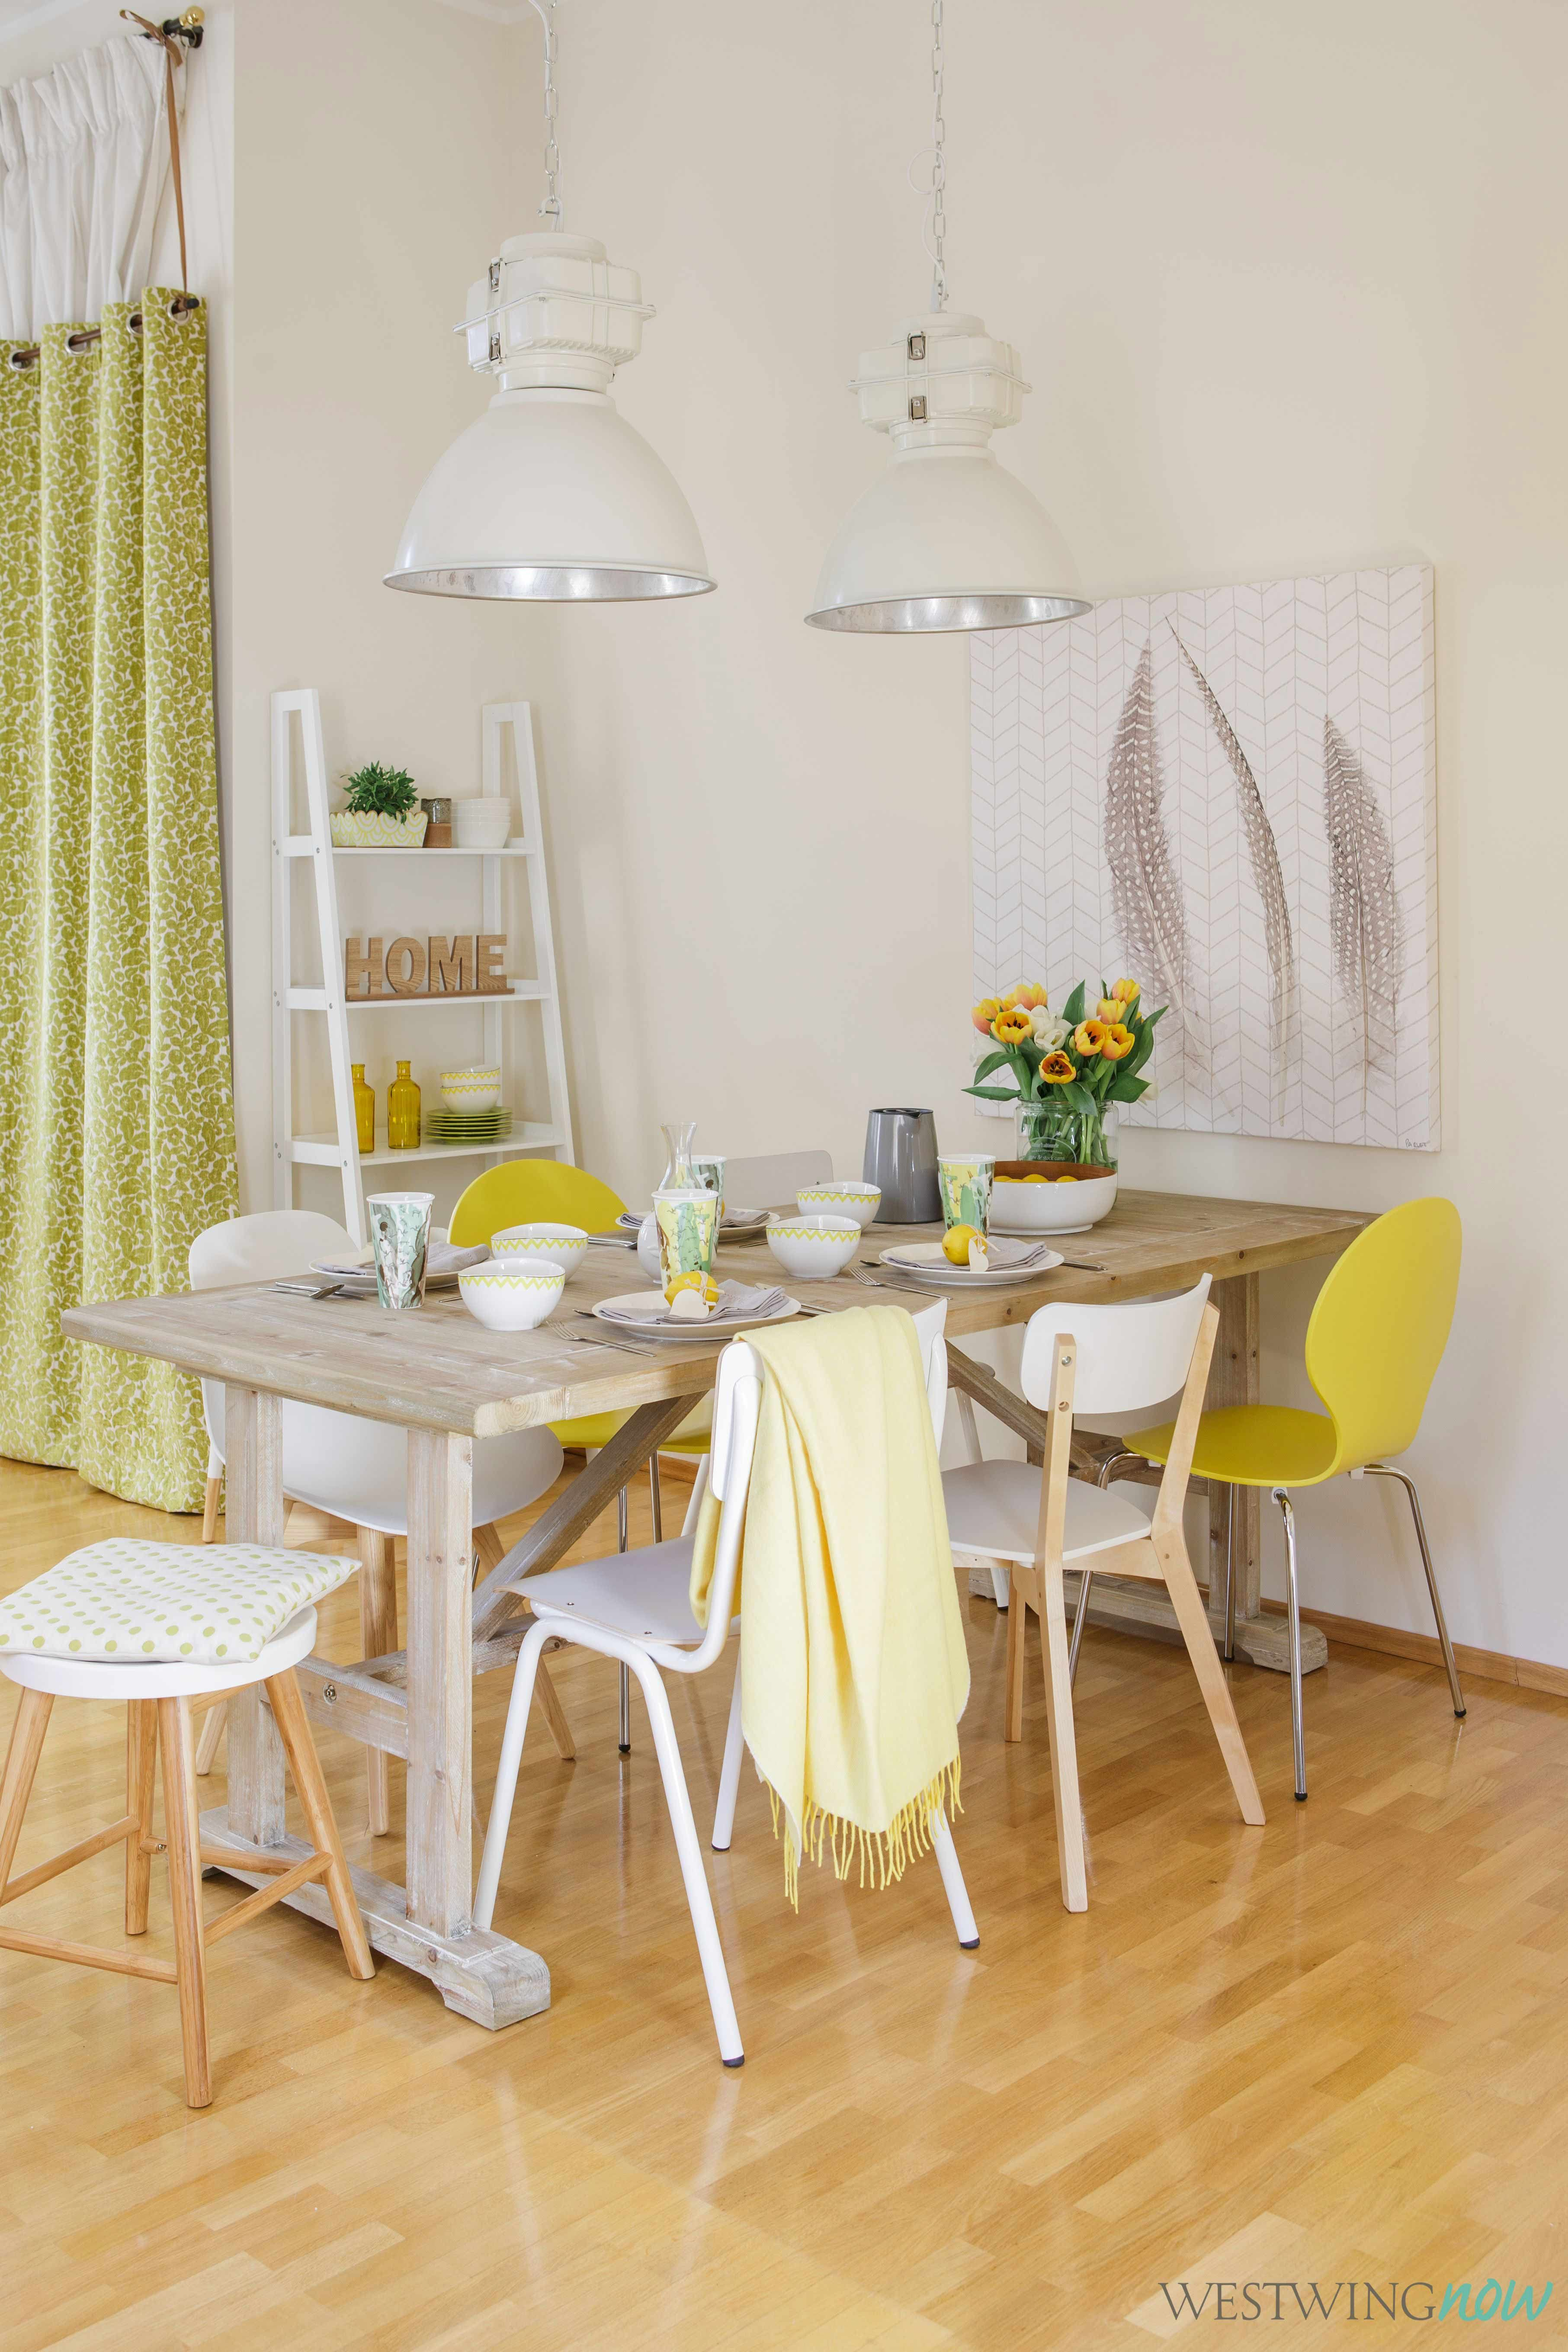 Skandinavische Design Möbel Inspirational Design Stuhle Beruhmt [maxycribs]  ... Designer Arne Jacobsens Siebener Stuhl, Auch Bekannt Als Modell 3107.